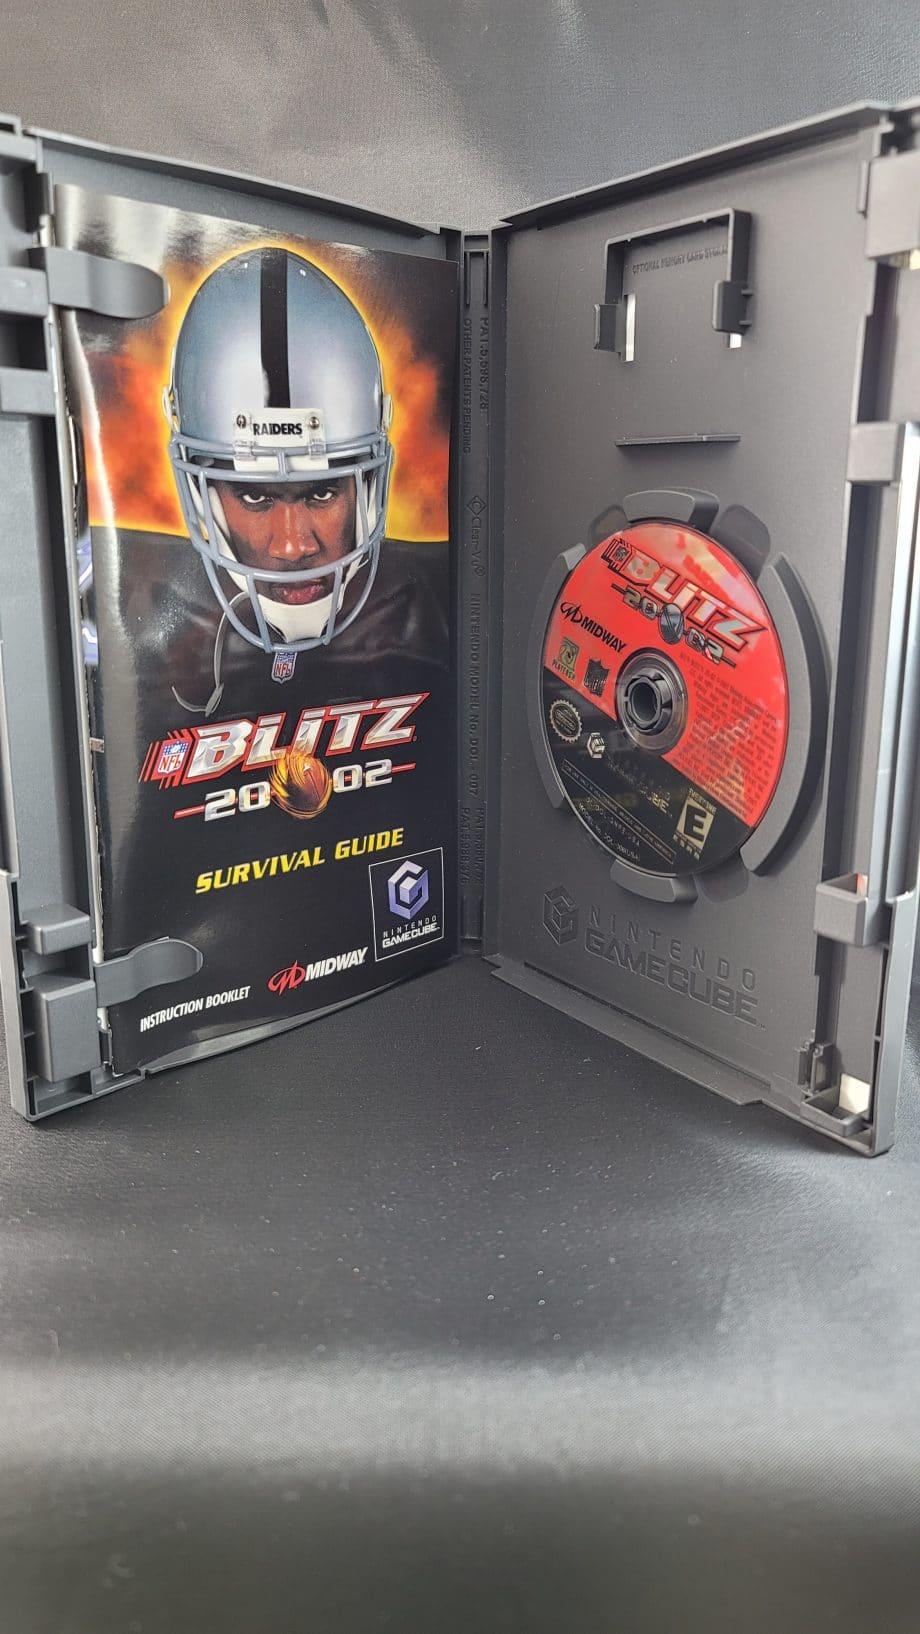 GameCube NFL Blitz 20-02